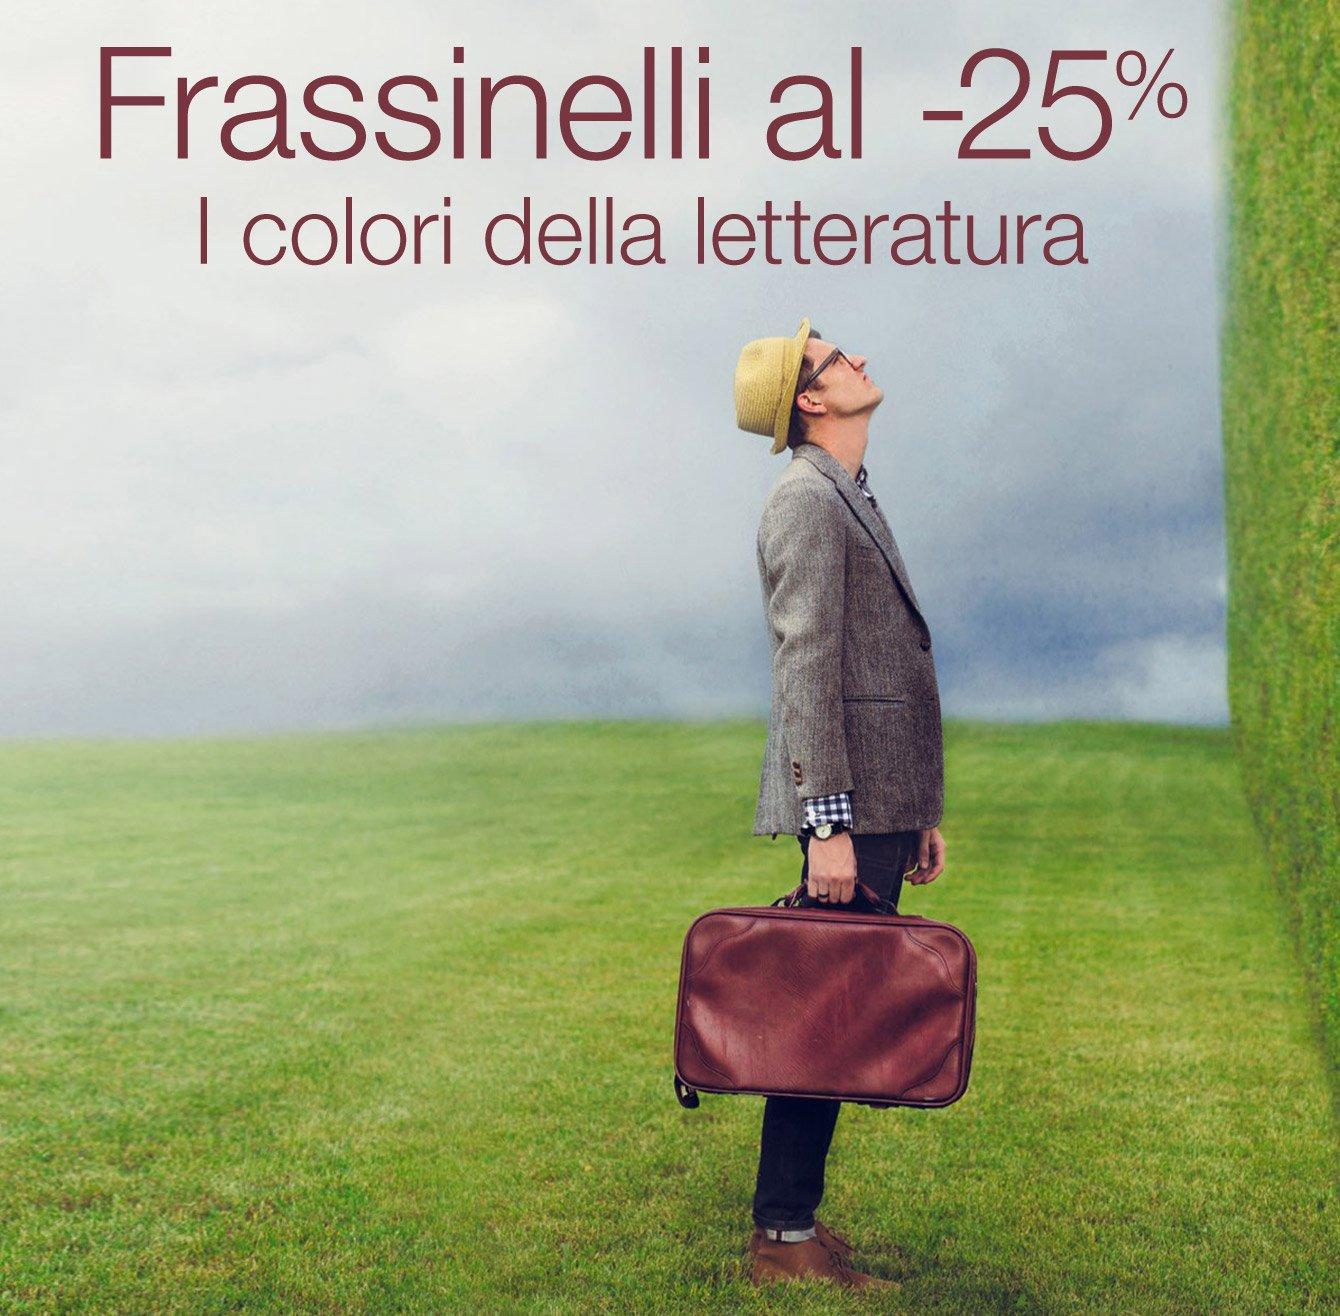 Frassinelli al -25%